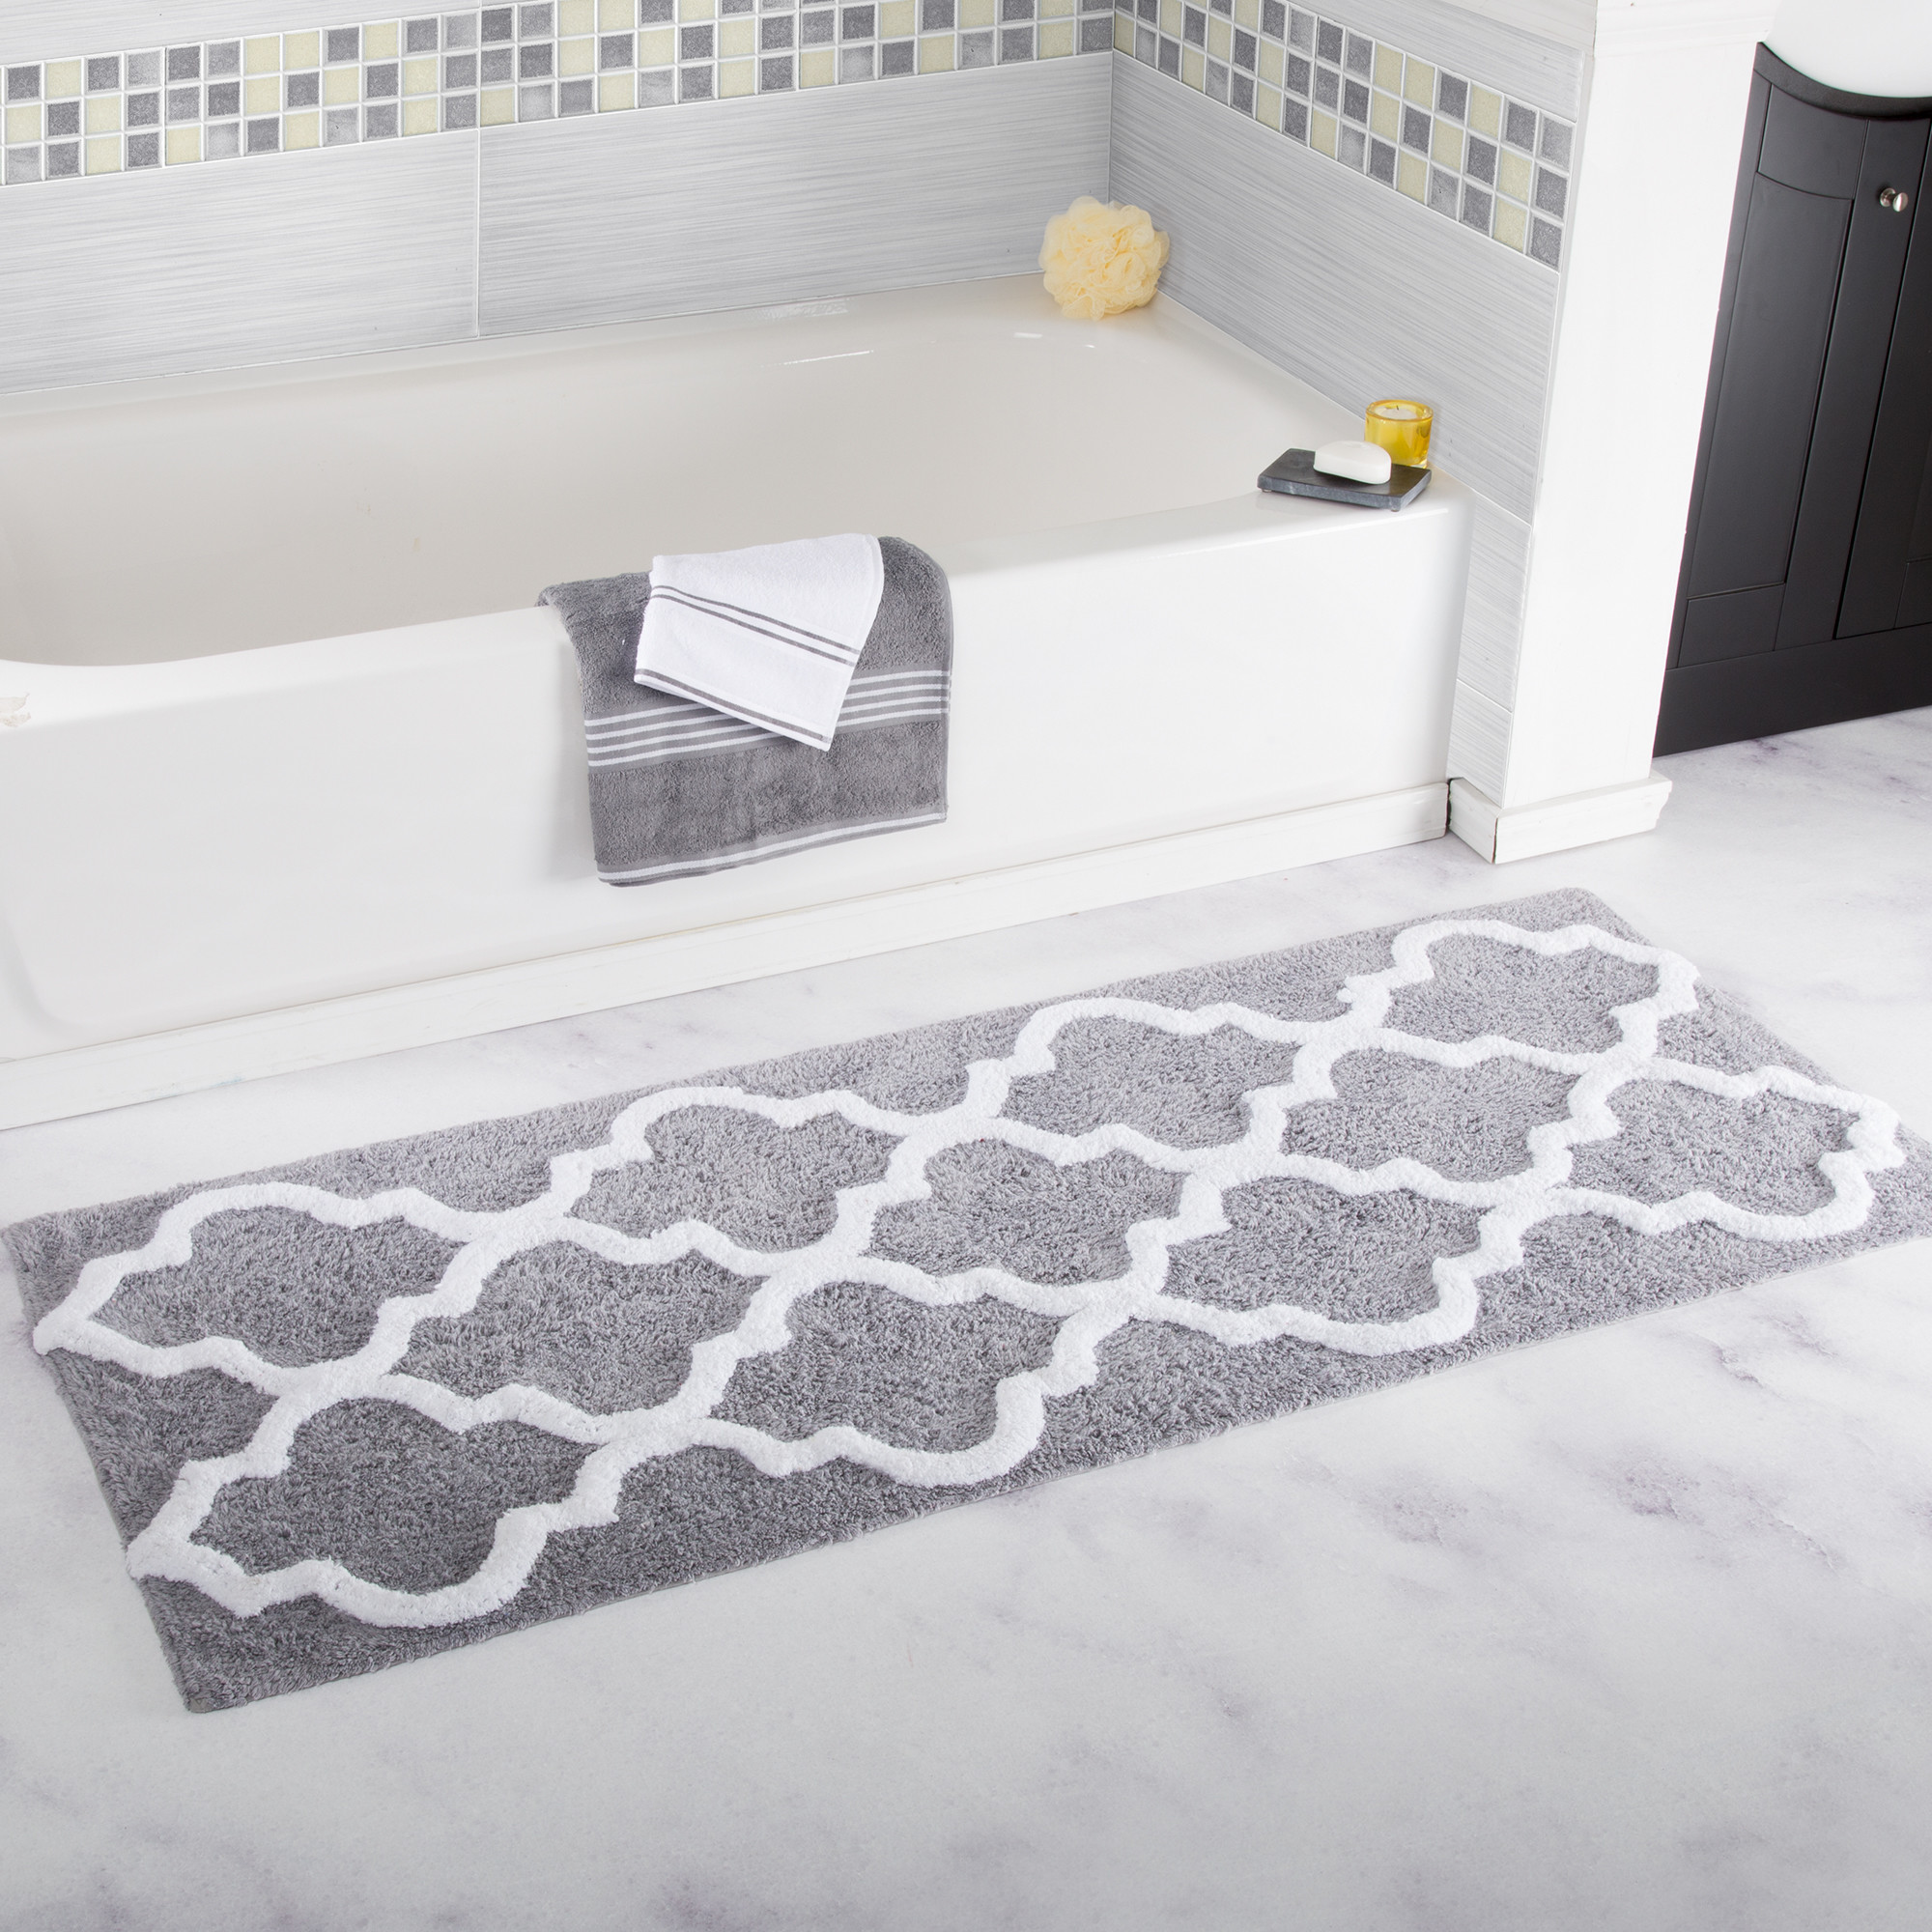 Us 18 84 52 Off 45x120cm Plush Bedroom Anti Slip Bath Mats Bathroom Floor Mat Toilet Water Absorption Outdoor Rug Picnic Carpet Home Decor In